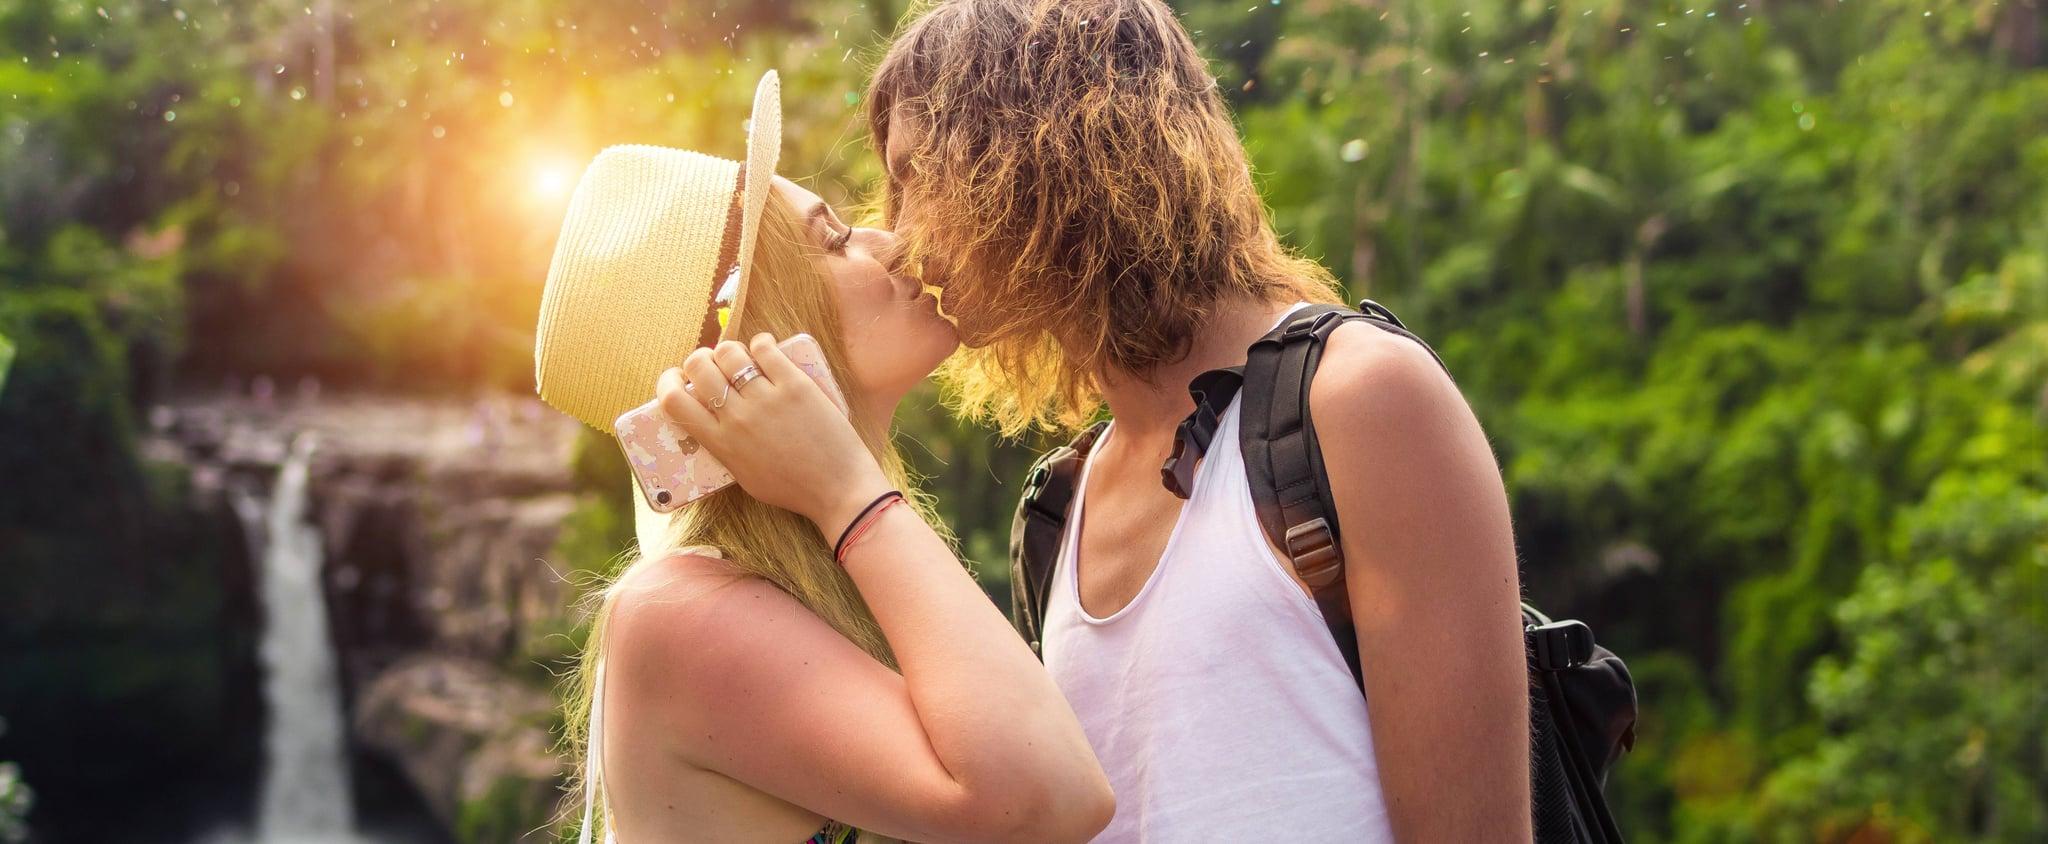 Honeymoon Destinations Based on Zodiac Signs